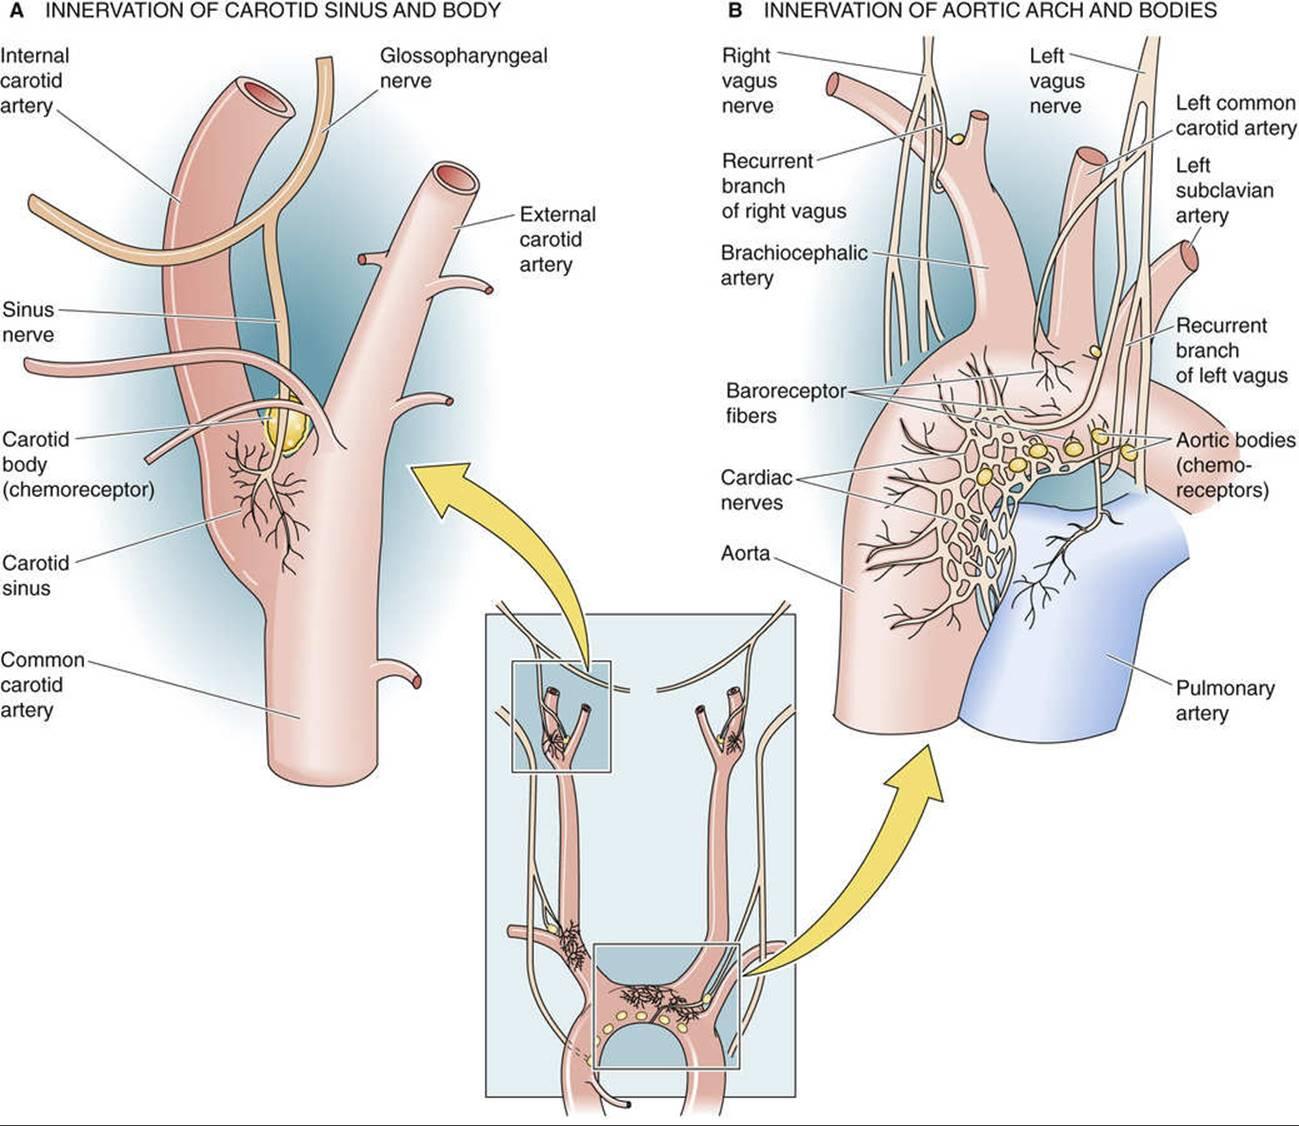 Short-Term Regulation of Arterial Pressure - Regulation of Arterial  Pressure and Cardiac Output - The Cardiovascular System - Medical  Physiology, 3rd Edition